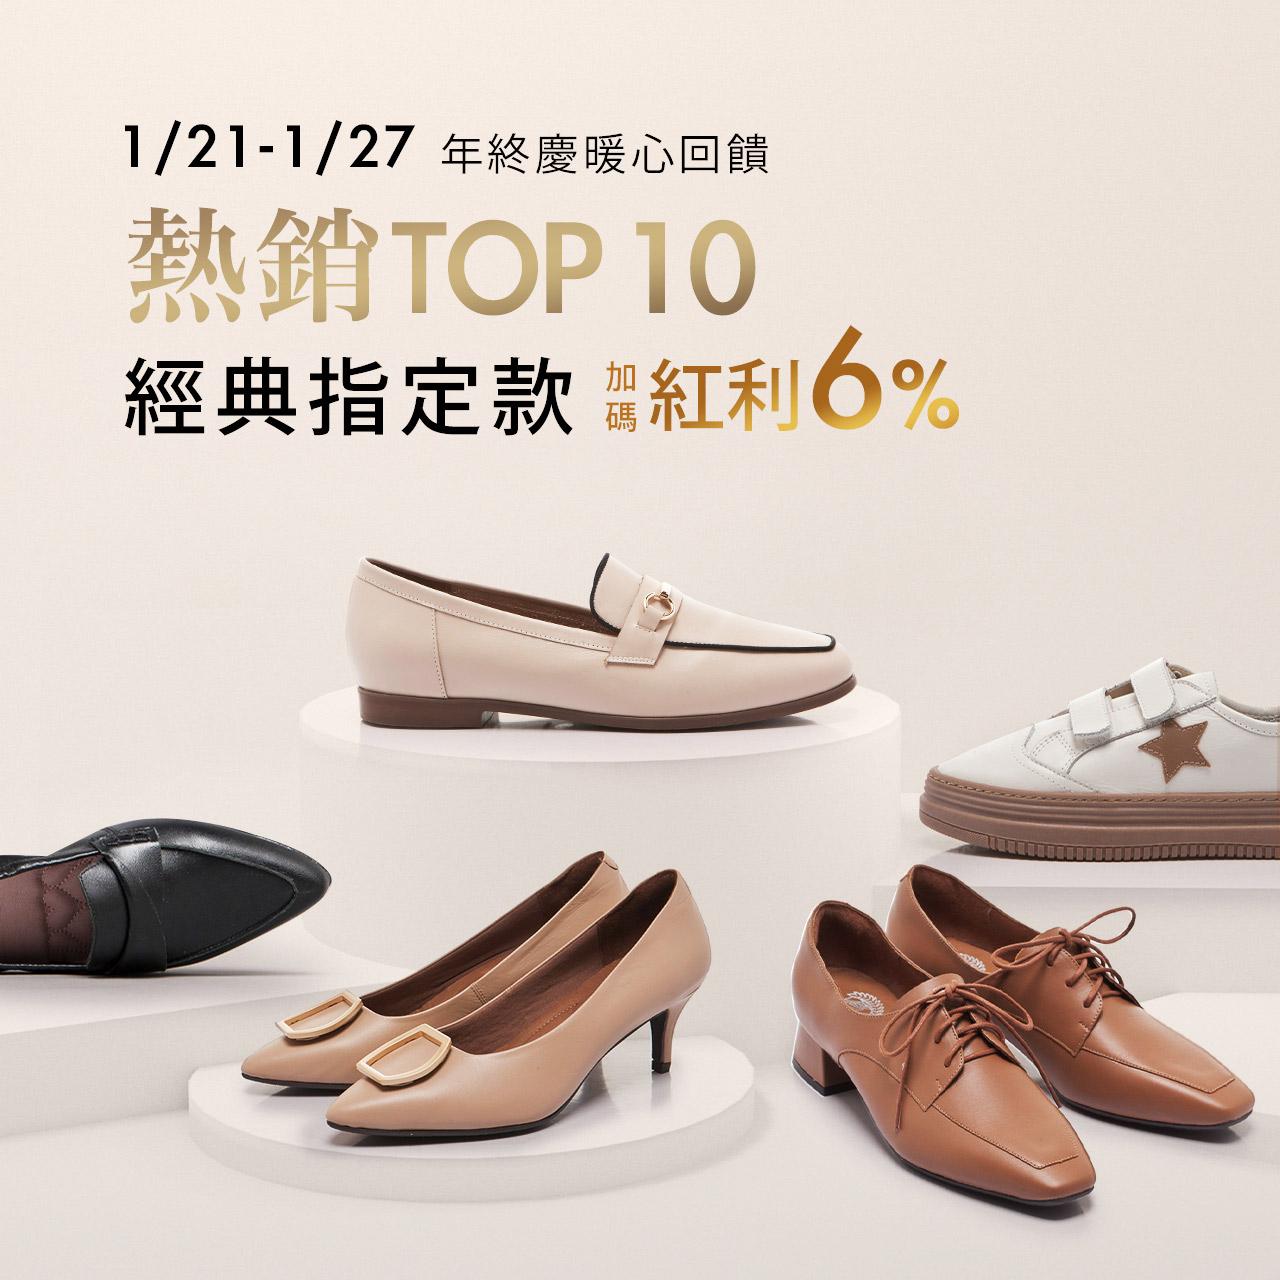 熱銷TOP10-1